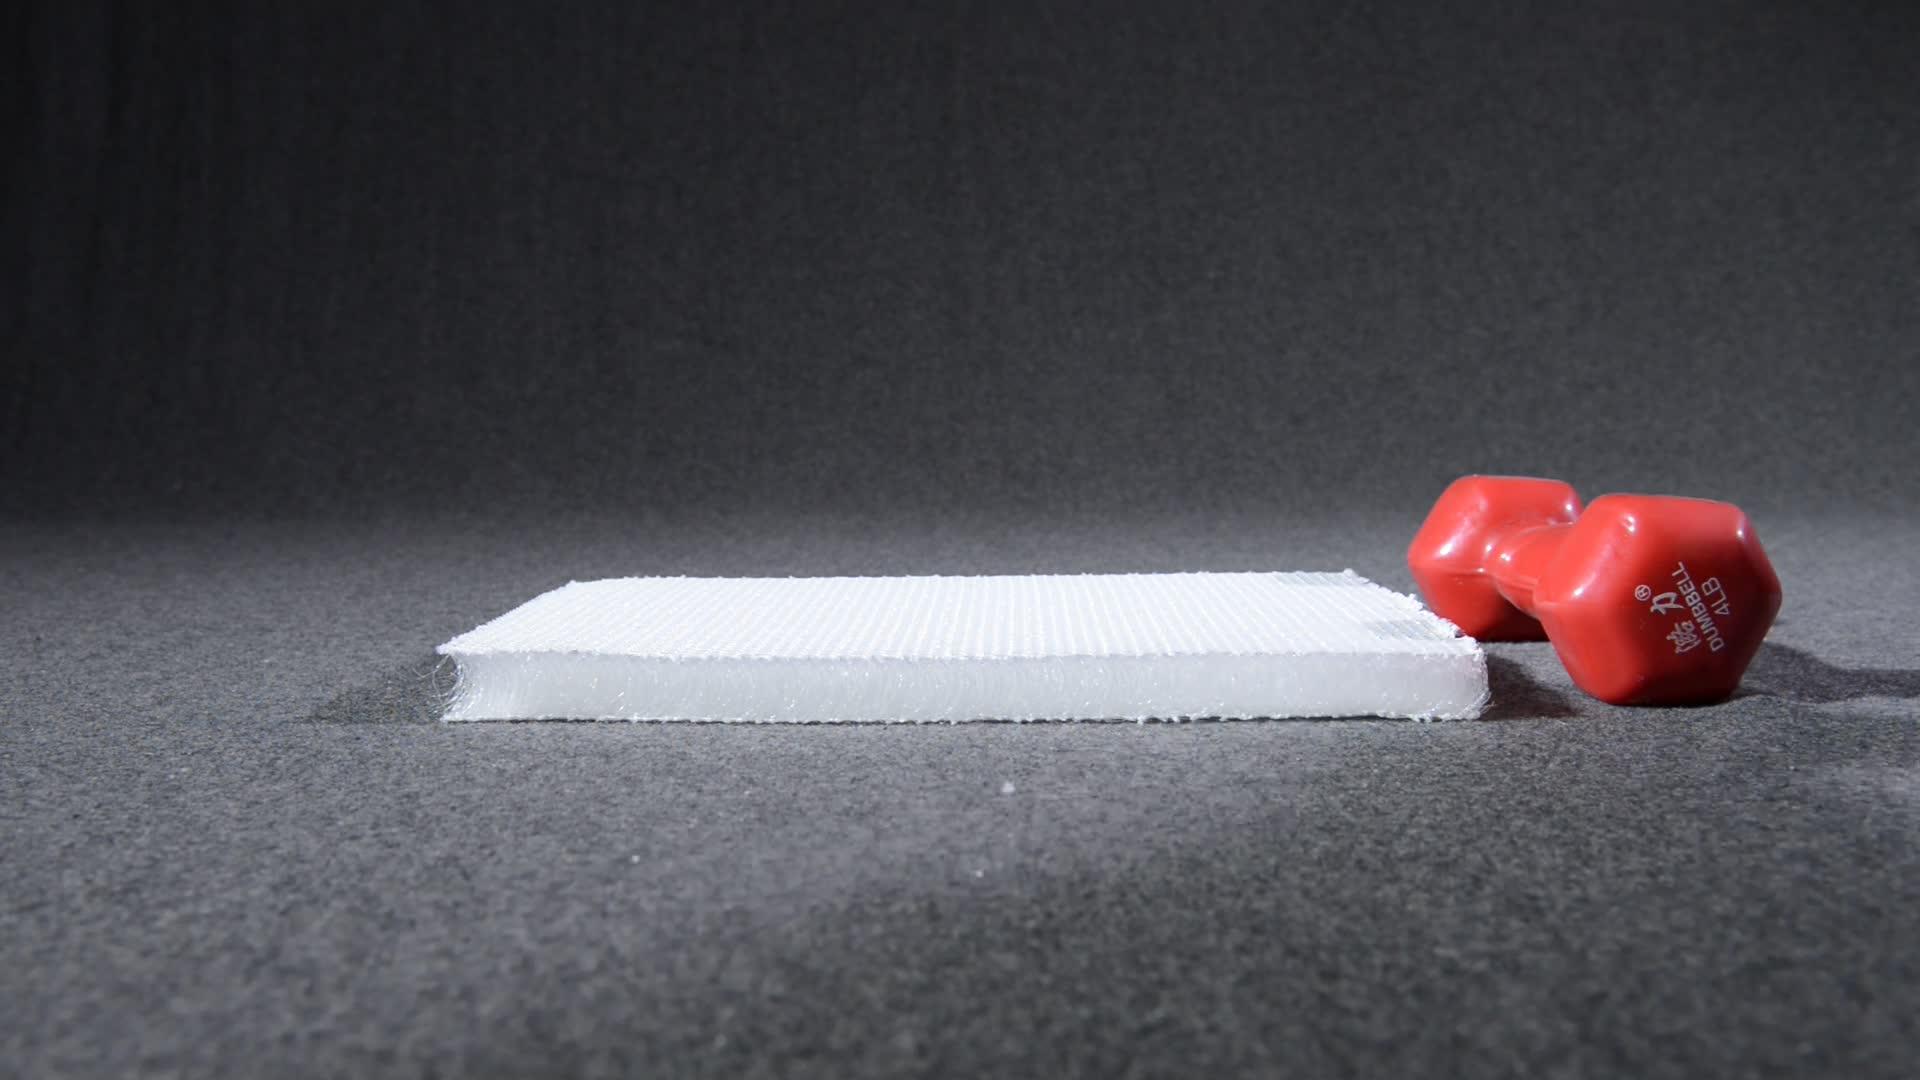 Nach muster design 10mm dicke 650 gsm polyester 3d air mesh für polster stoff